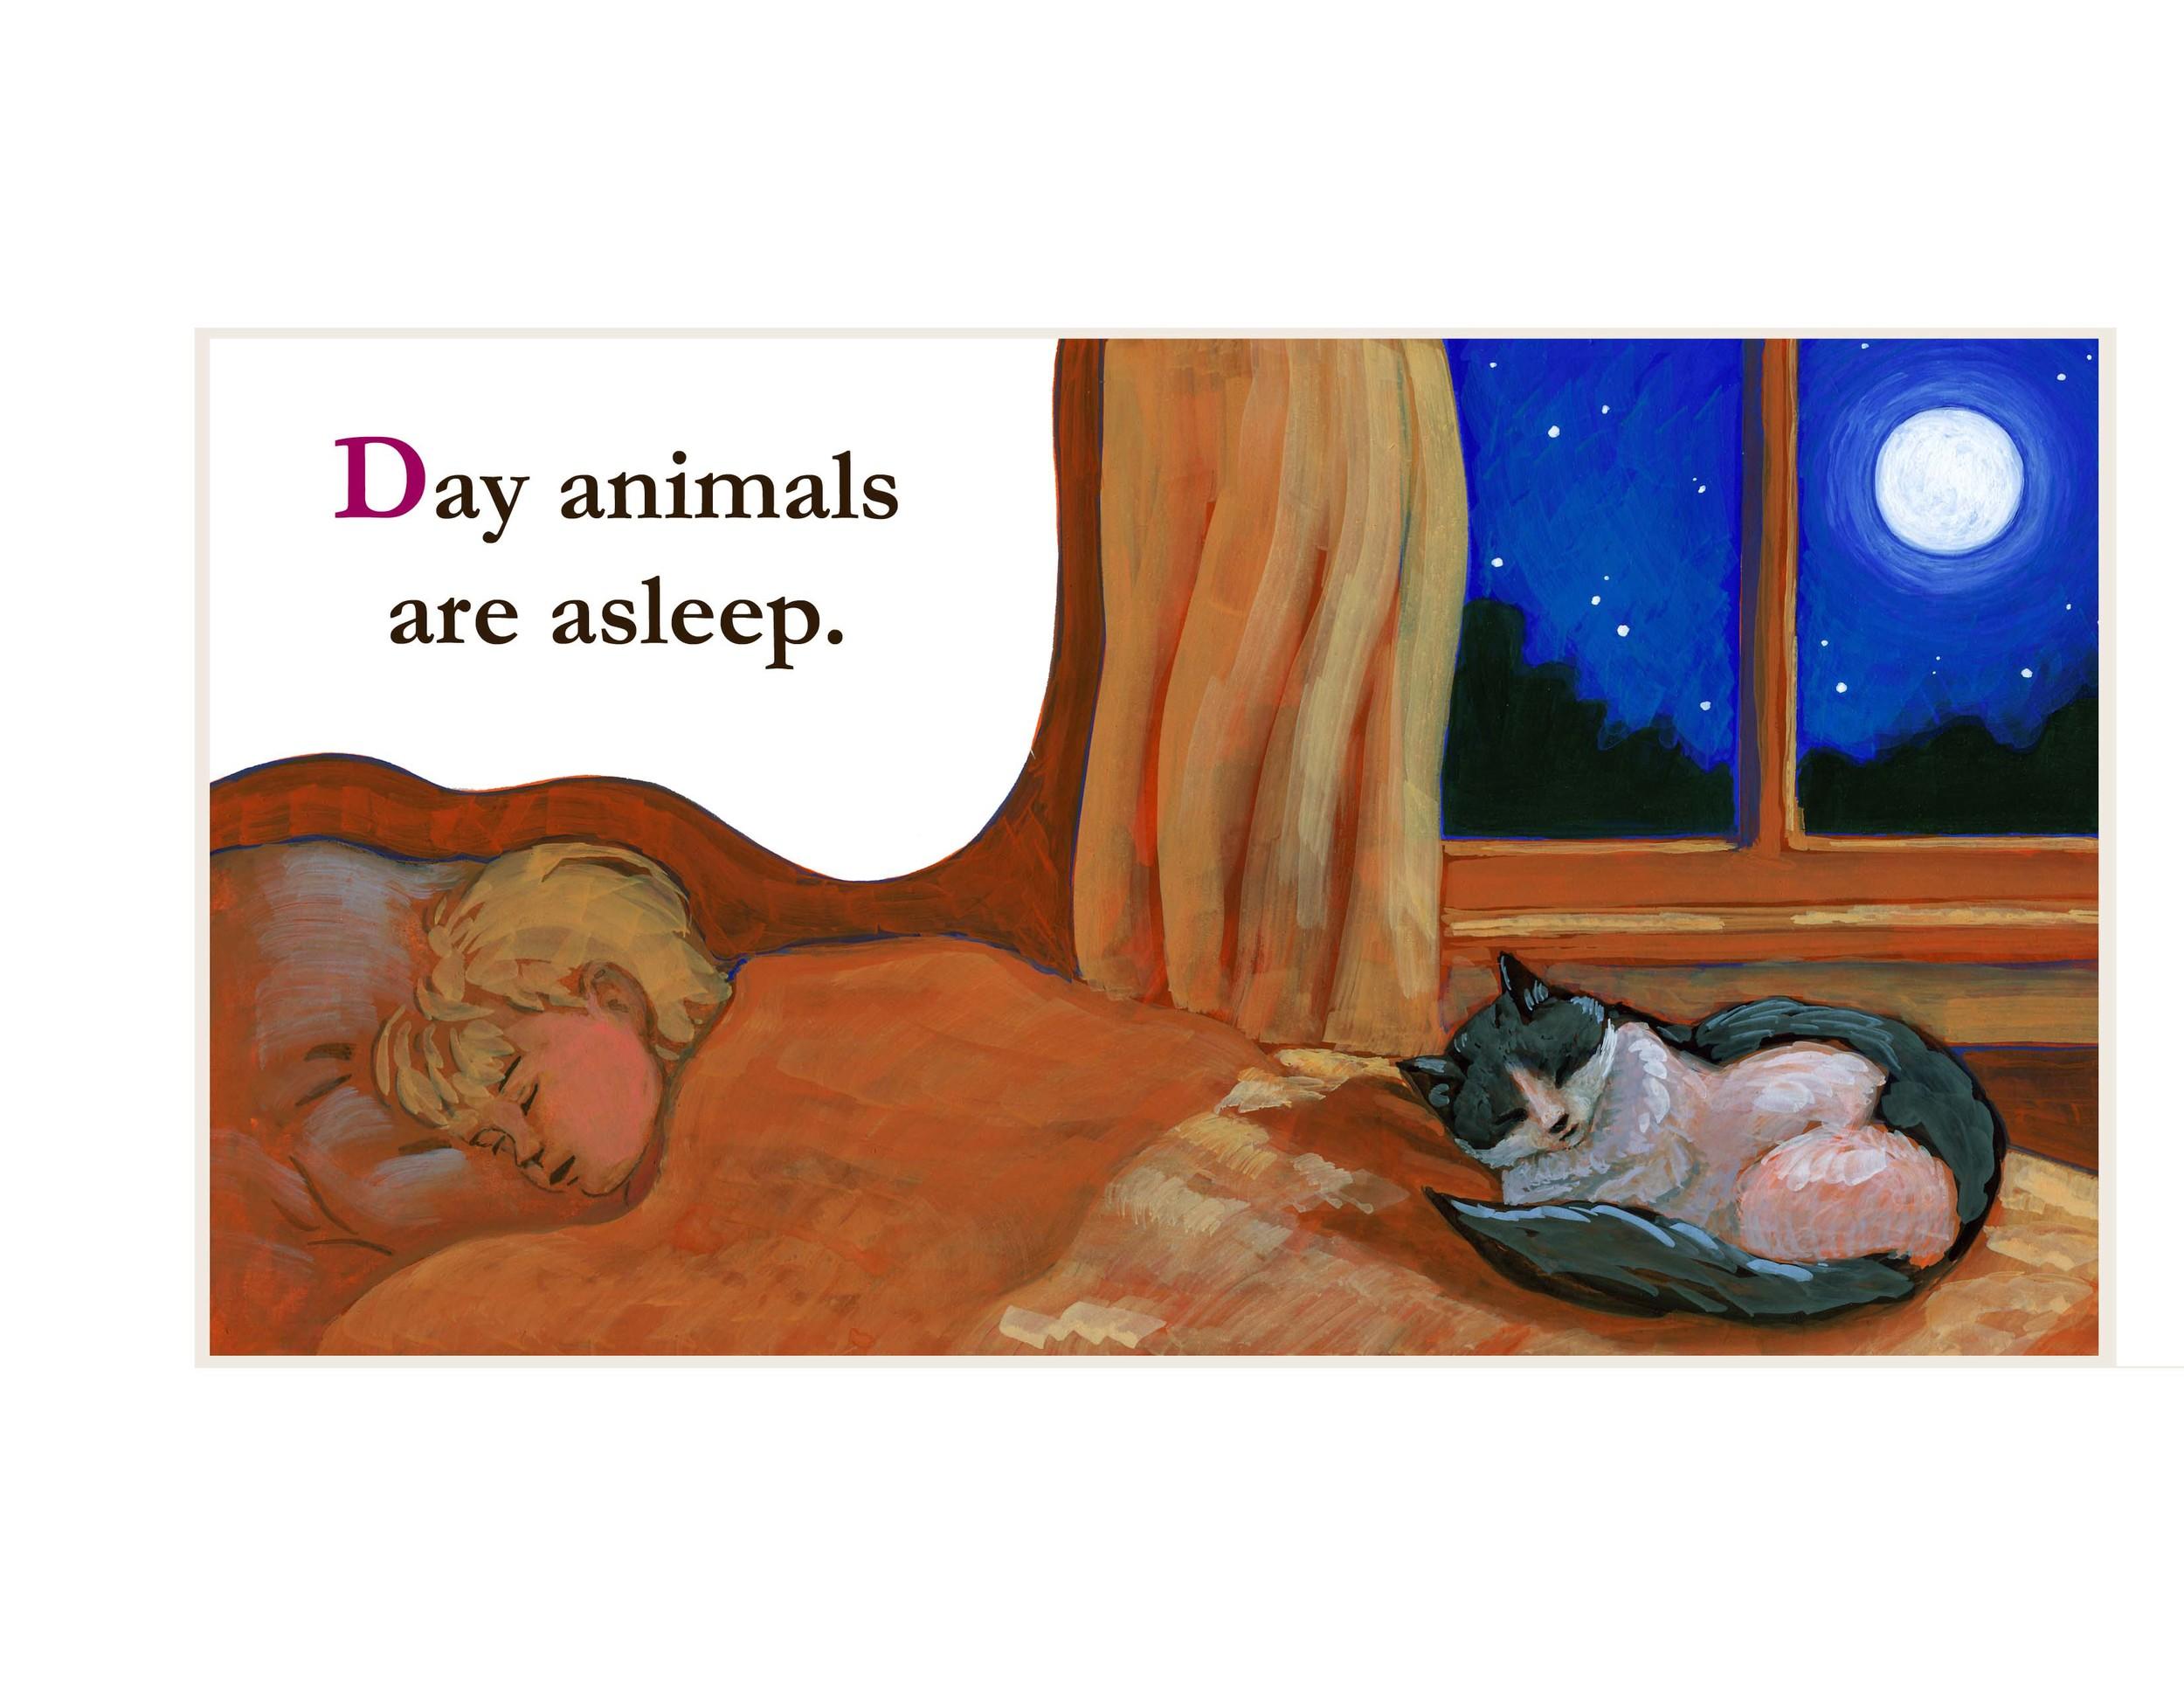 night animals book 13.jpg